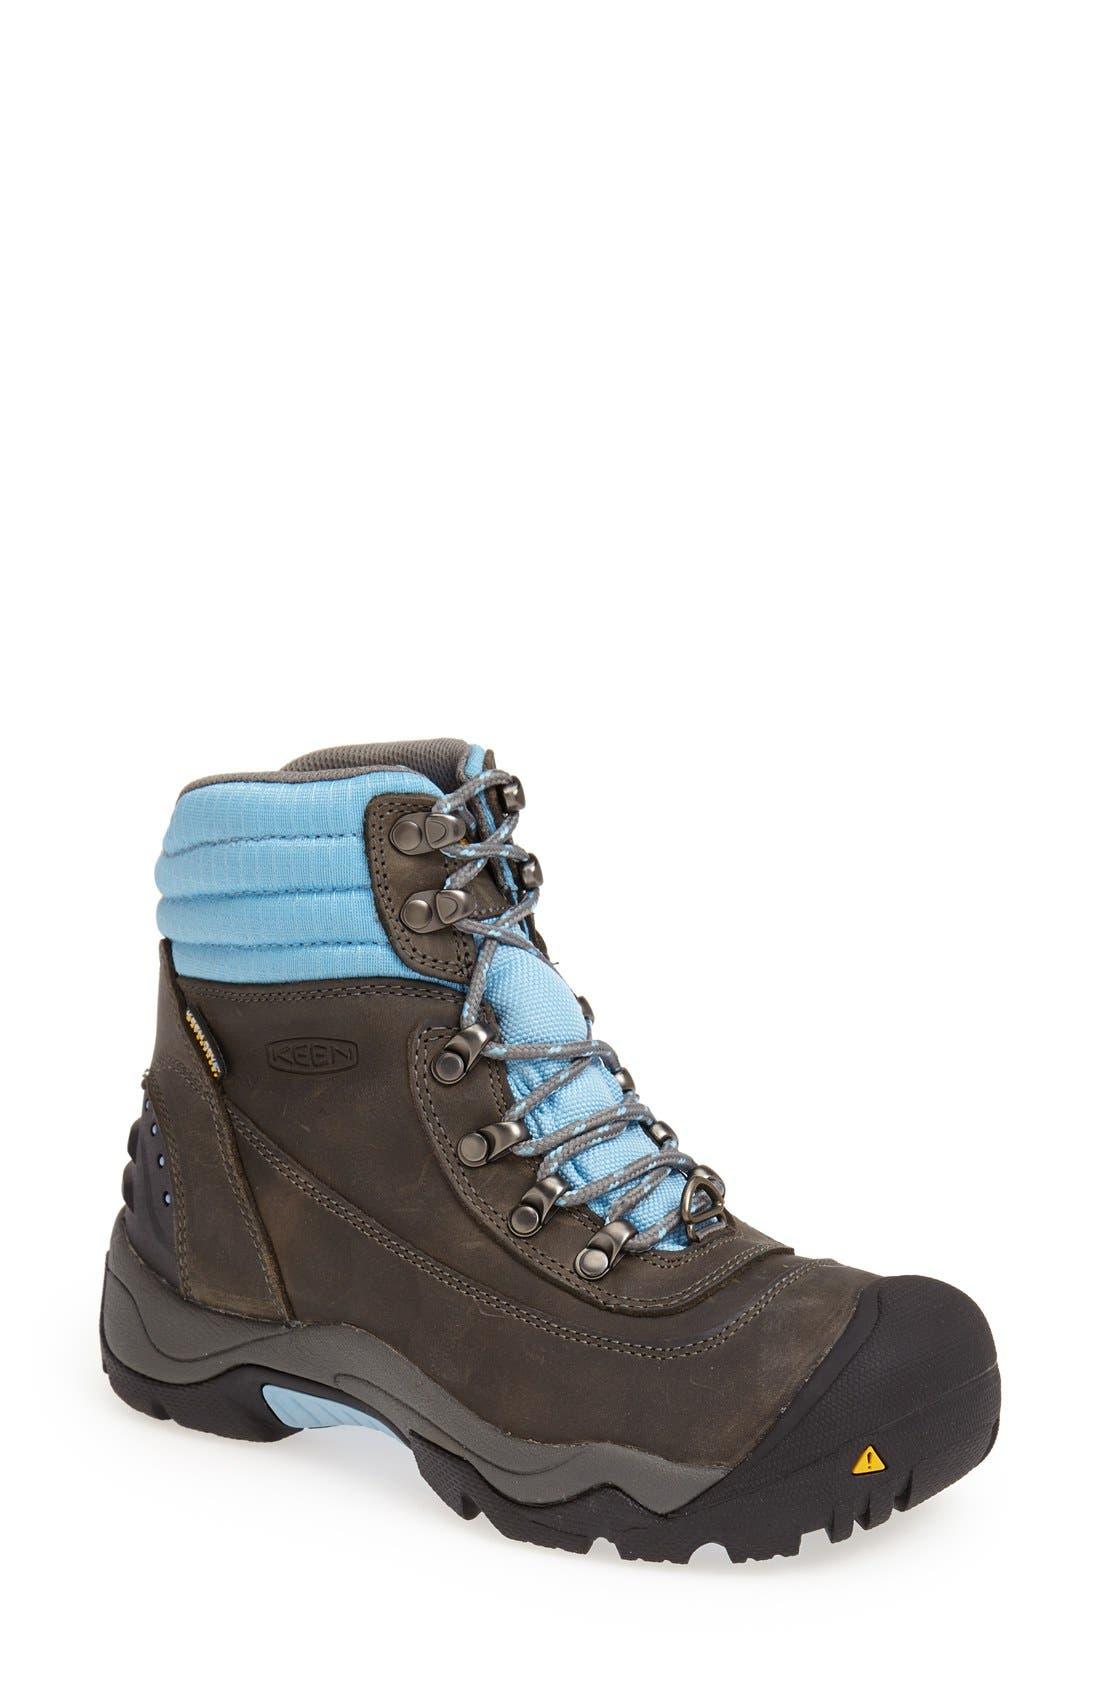 Alternate Image 1 Selected - Keen 'Revel II' Waterproof Snow Boot (Women)